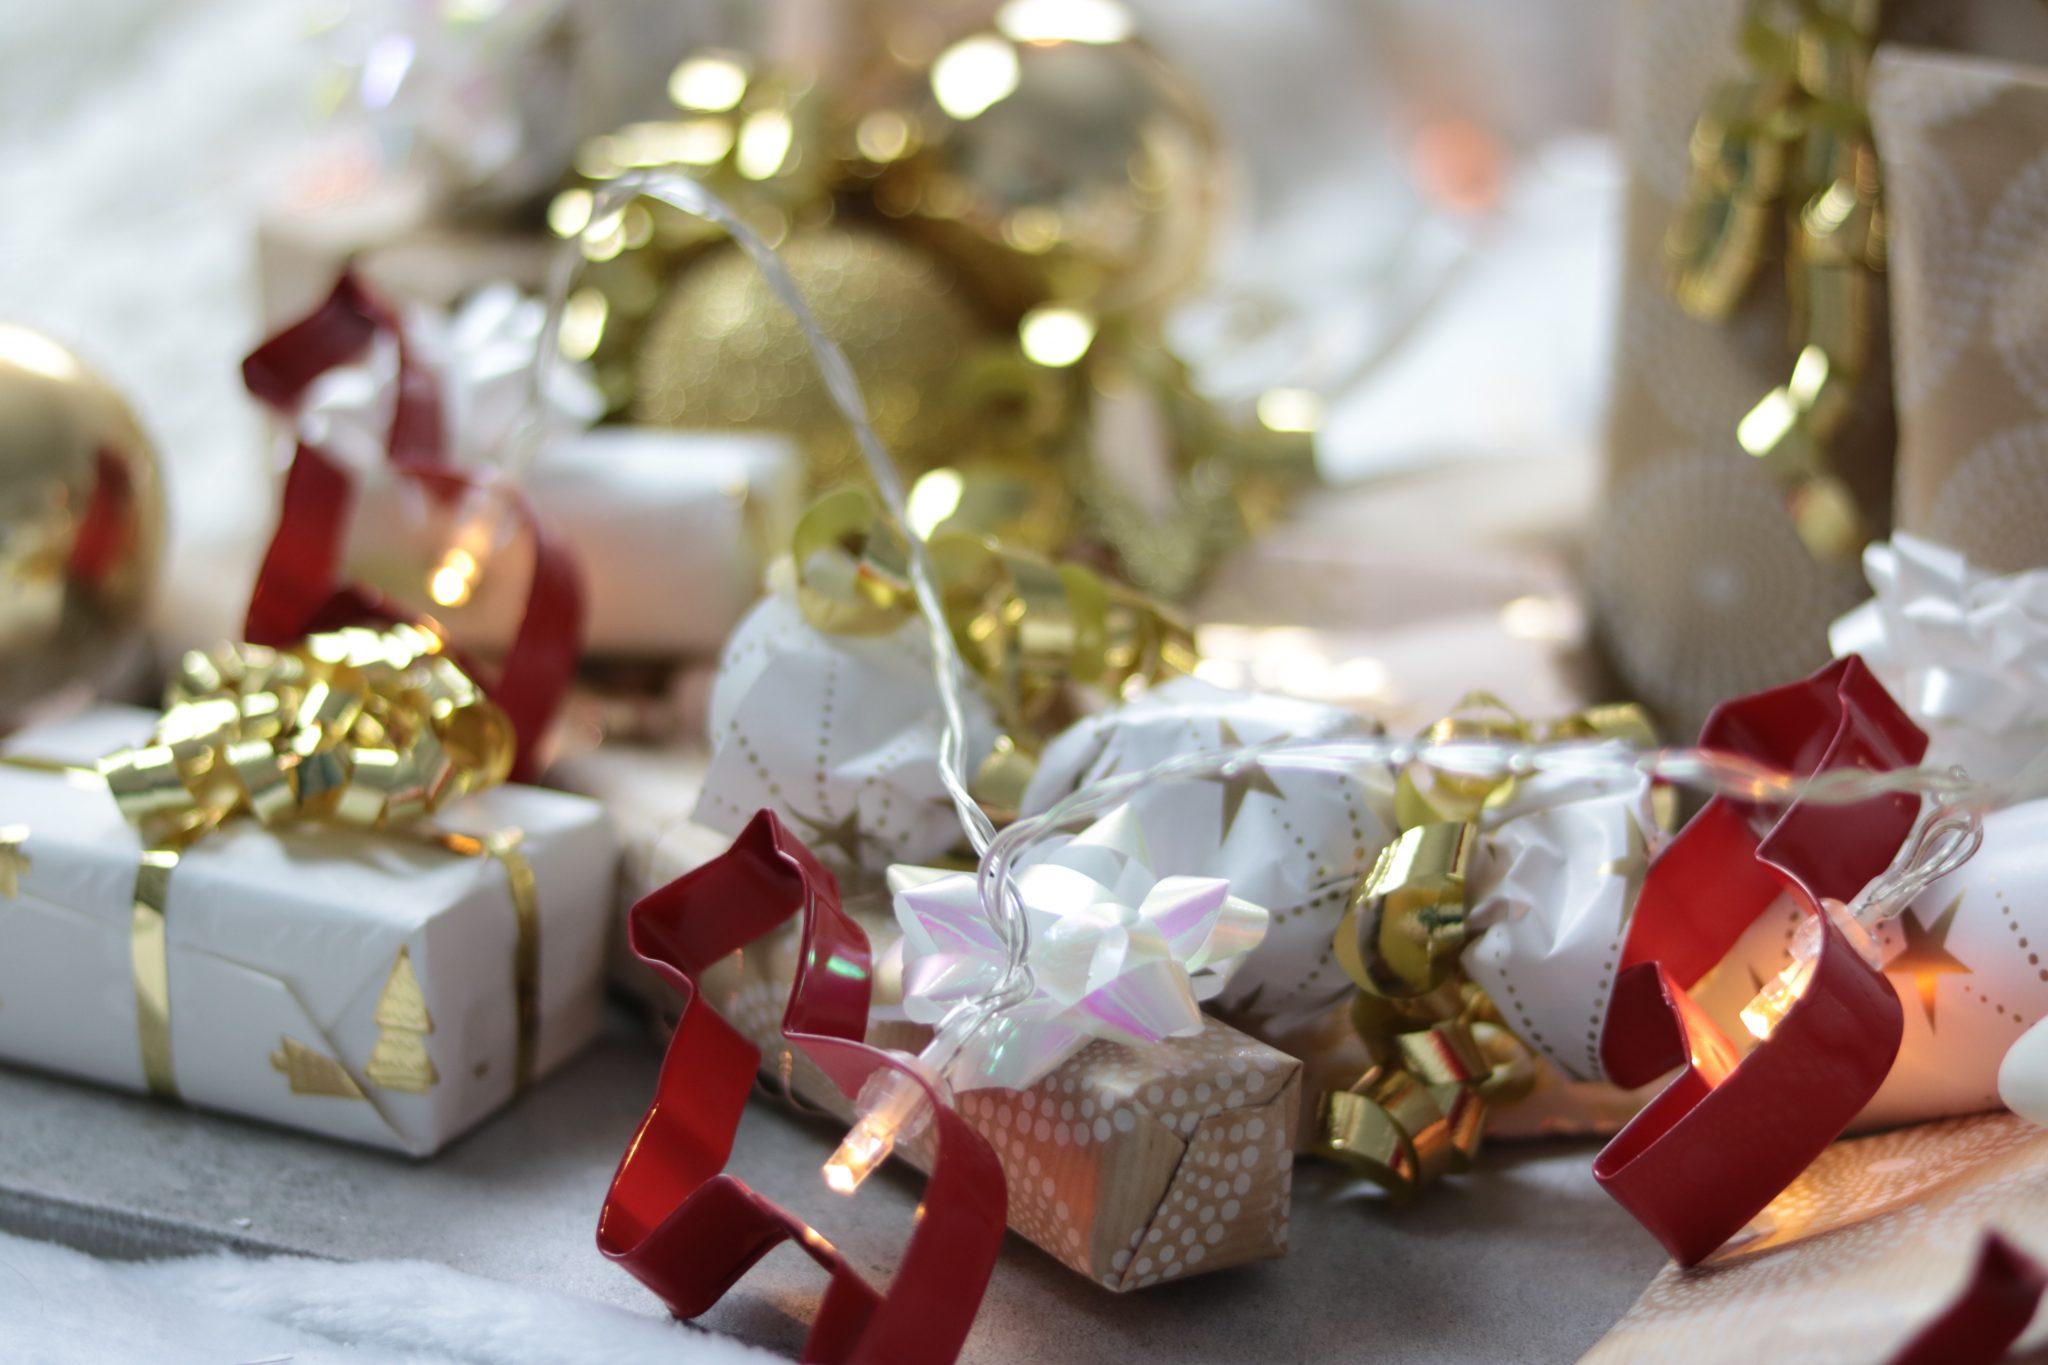 diy-blog-geschenke-originell-verpacken